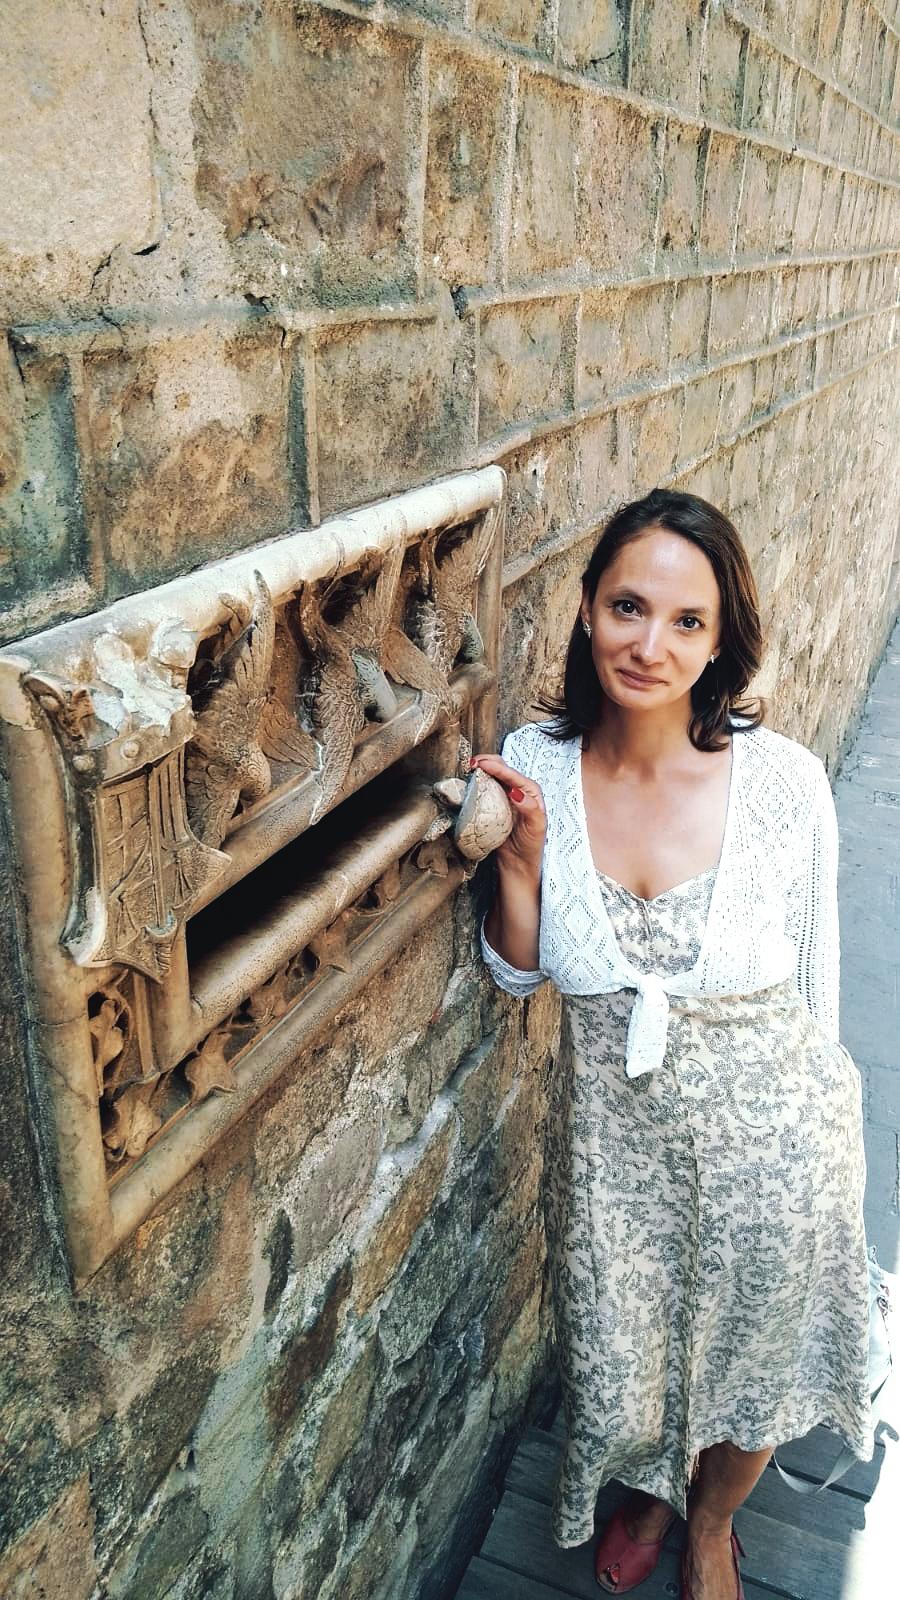 Гид в Барселоне. Мария Грисанова